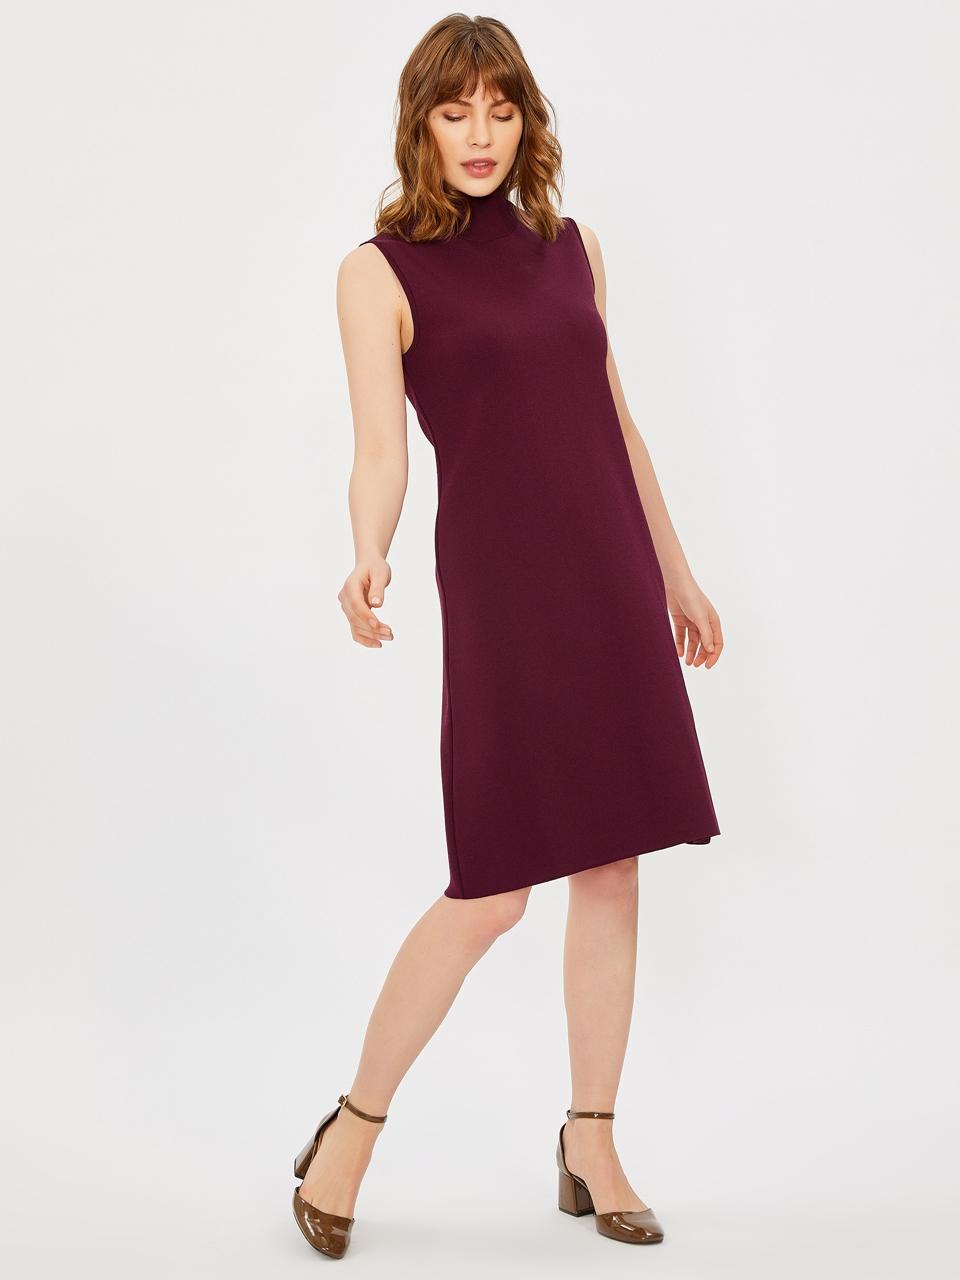 Sleeveless Half Turtleneck Dress